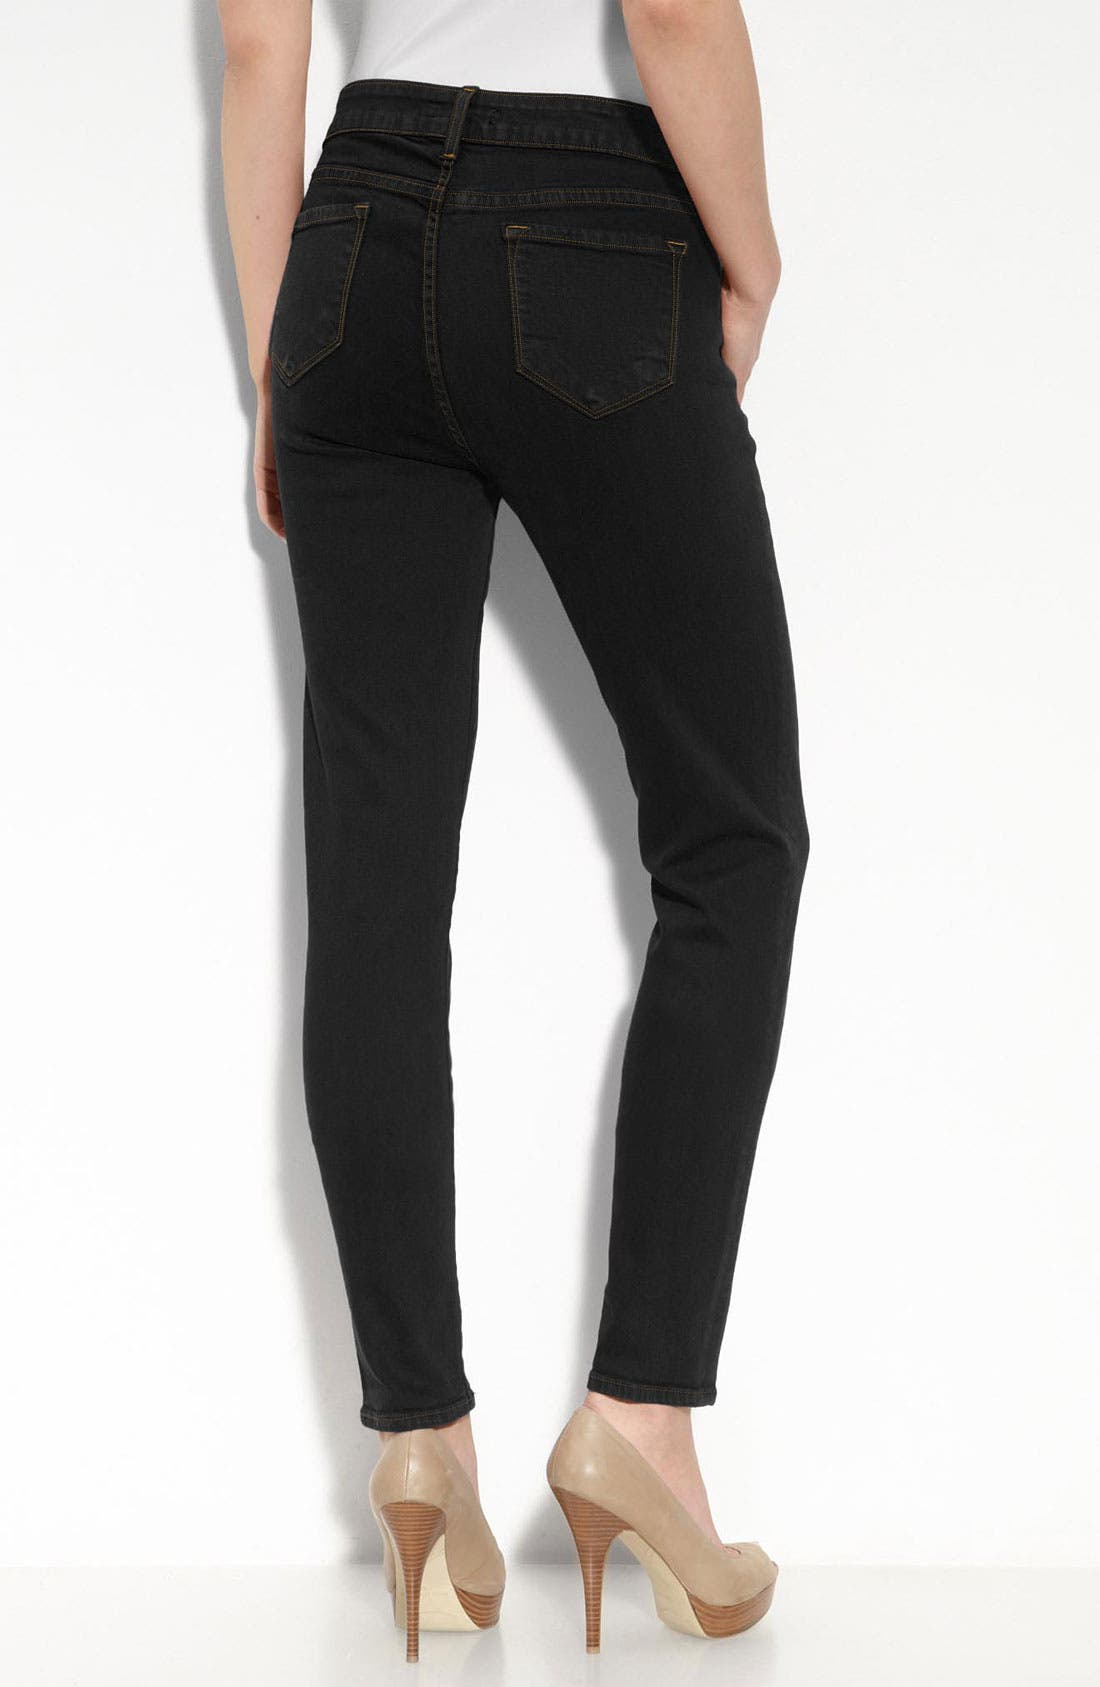 BLUE ESSENCE 'Eliot' Skinny Jeans, Main, color, 005